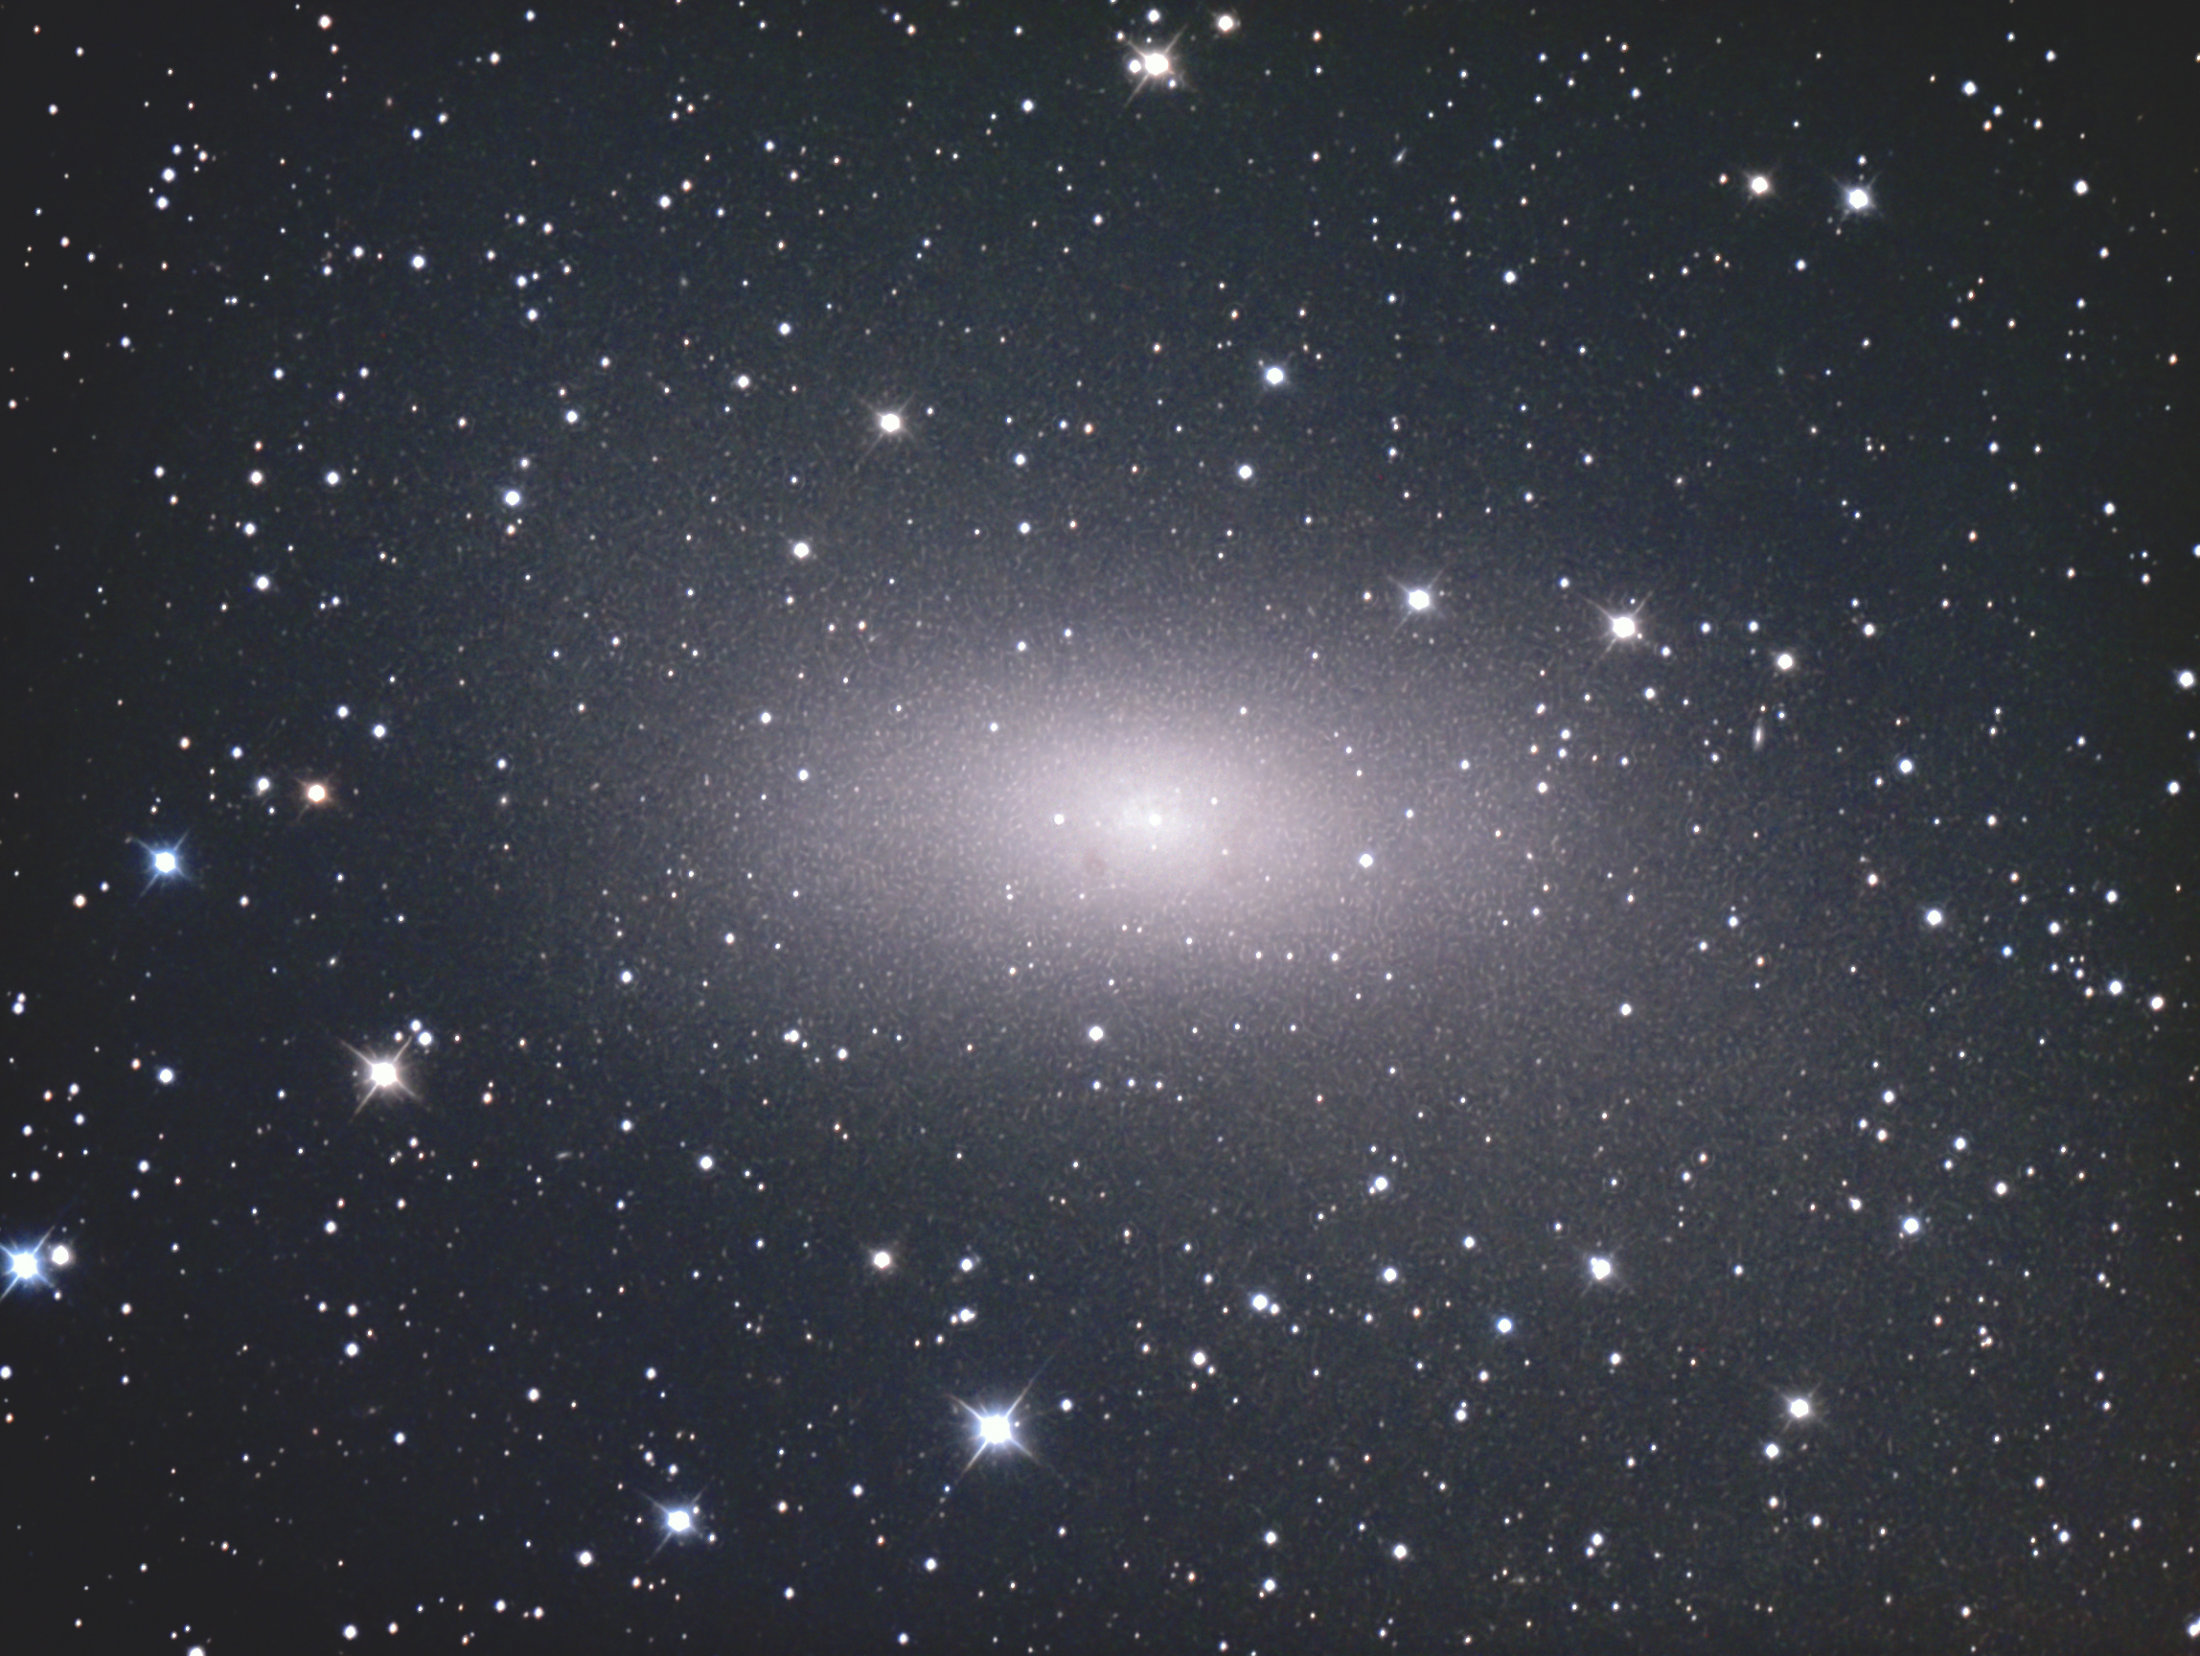 NGC205 - Antoni Vidal